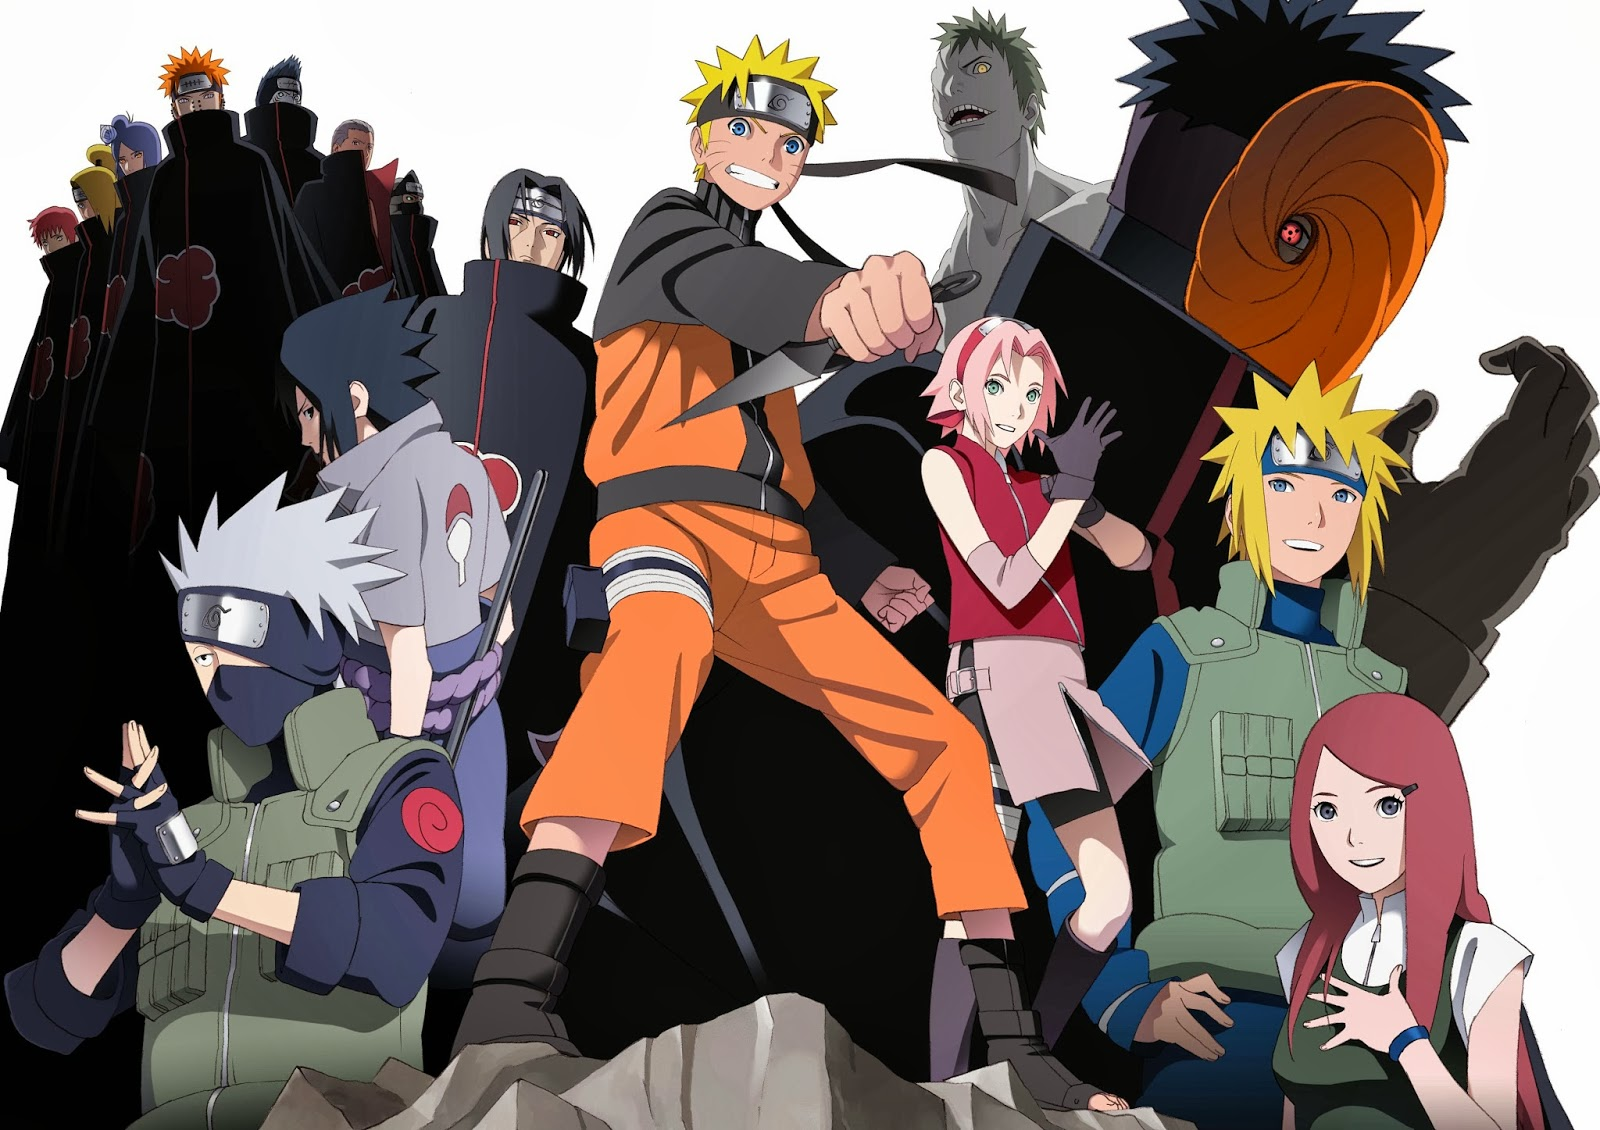 NarutoShippuden: Naruto Shippuden Ost 2 Zip